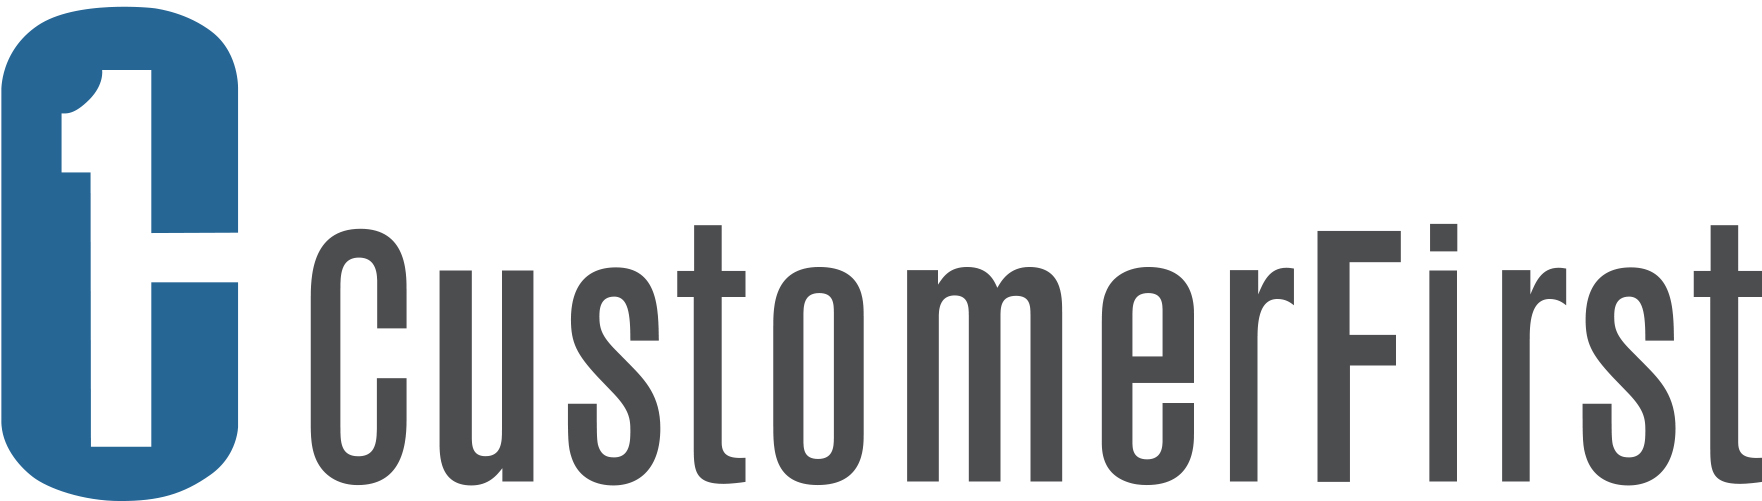 Customer First logo, colour